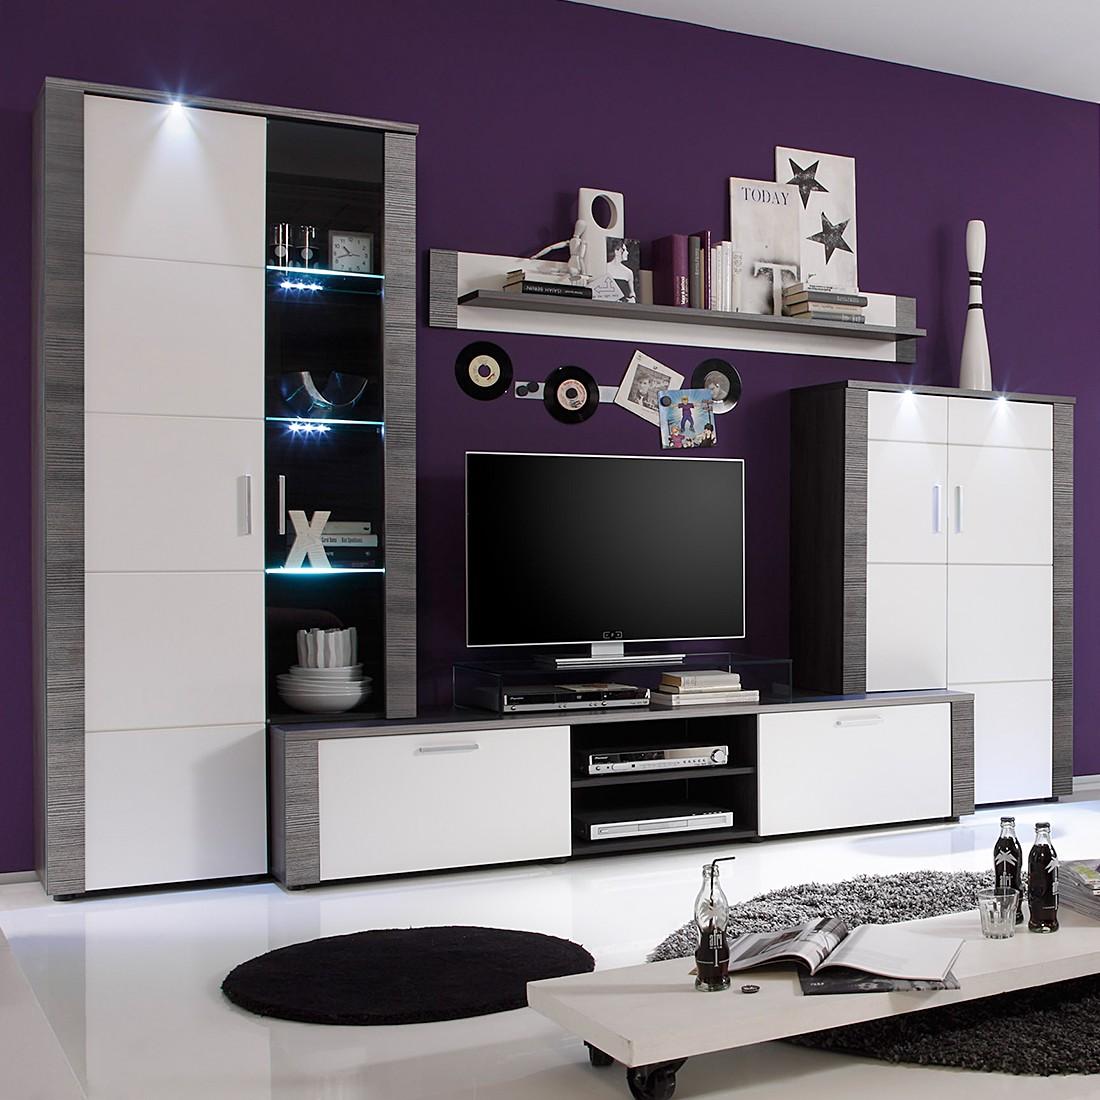 EEK A+, Ensemble de meubles TV Bormo (4 éléments) - Avec éclairage - Blanc brillant / Imitation frên